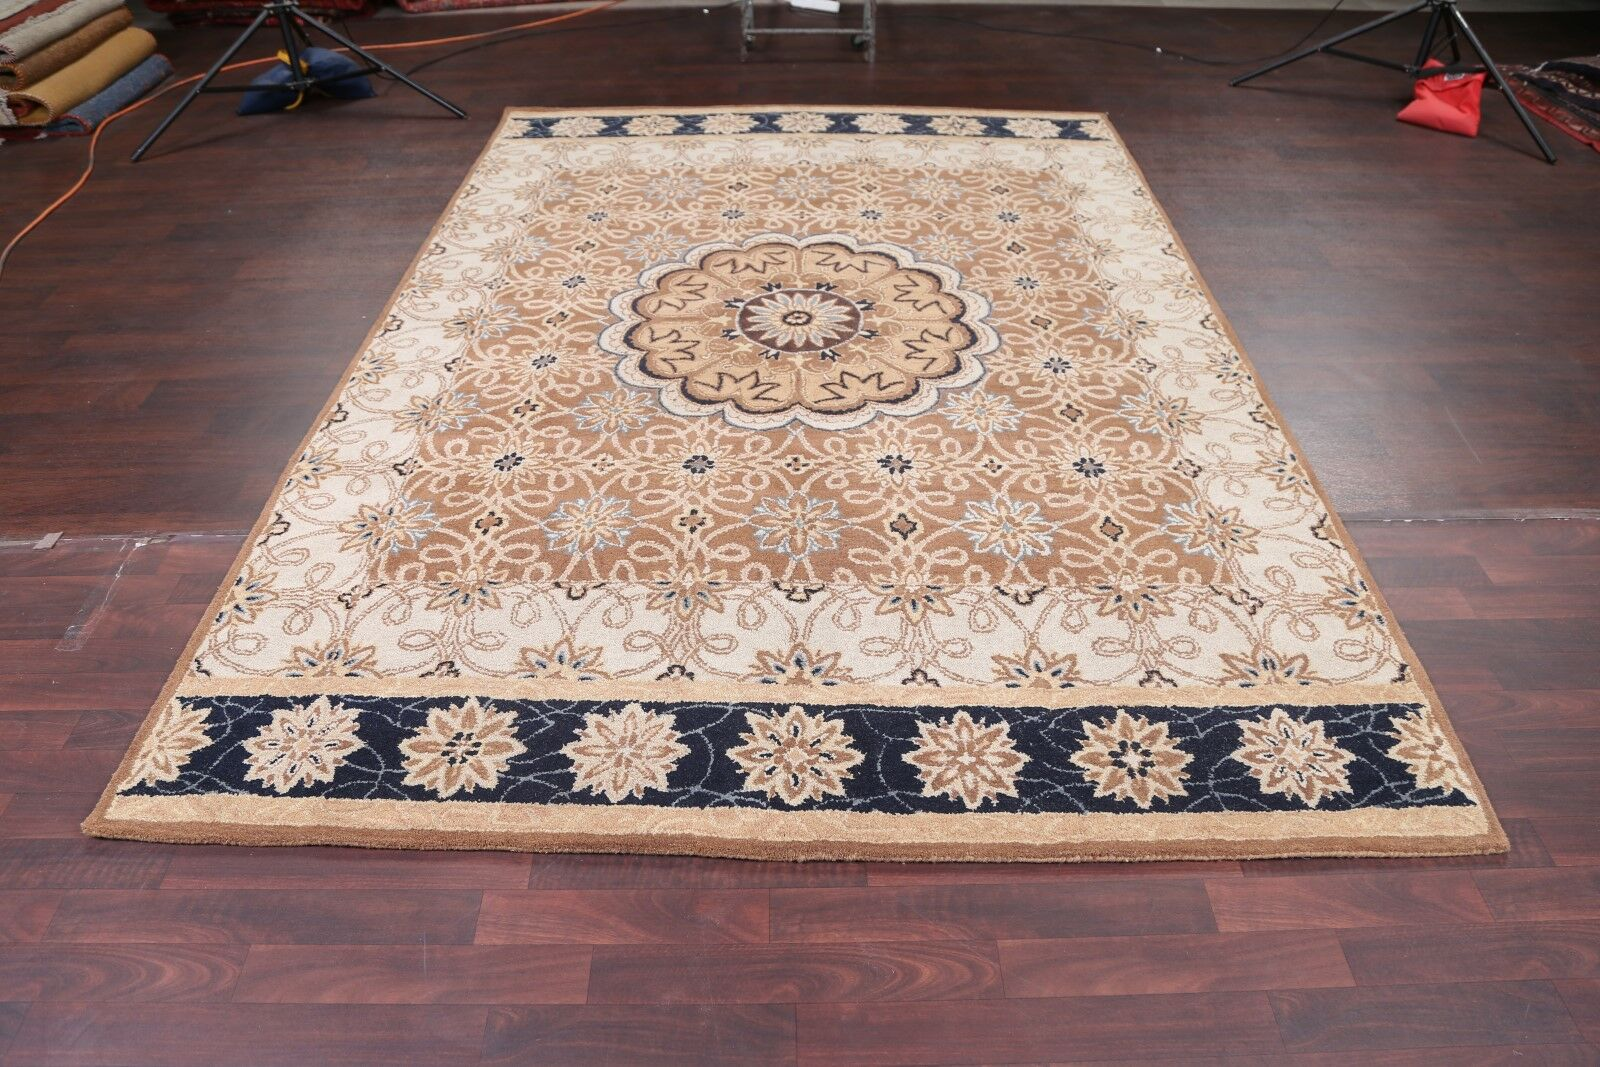 Pugh Oriental Hand-Tufted Wool Brown/White Area Rug